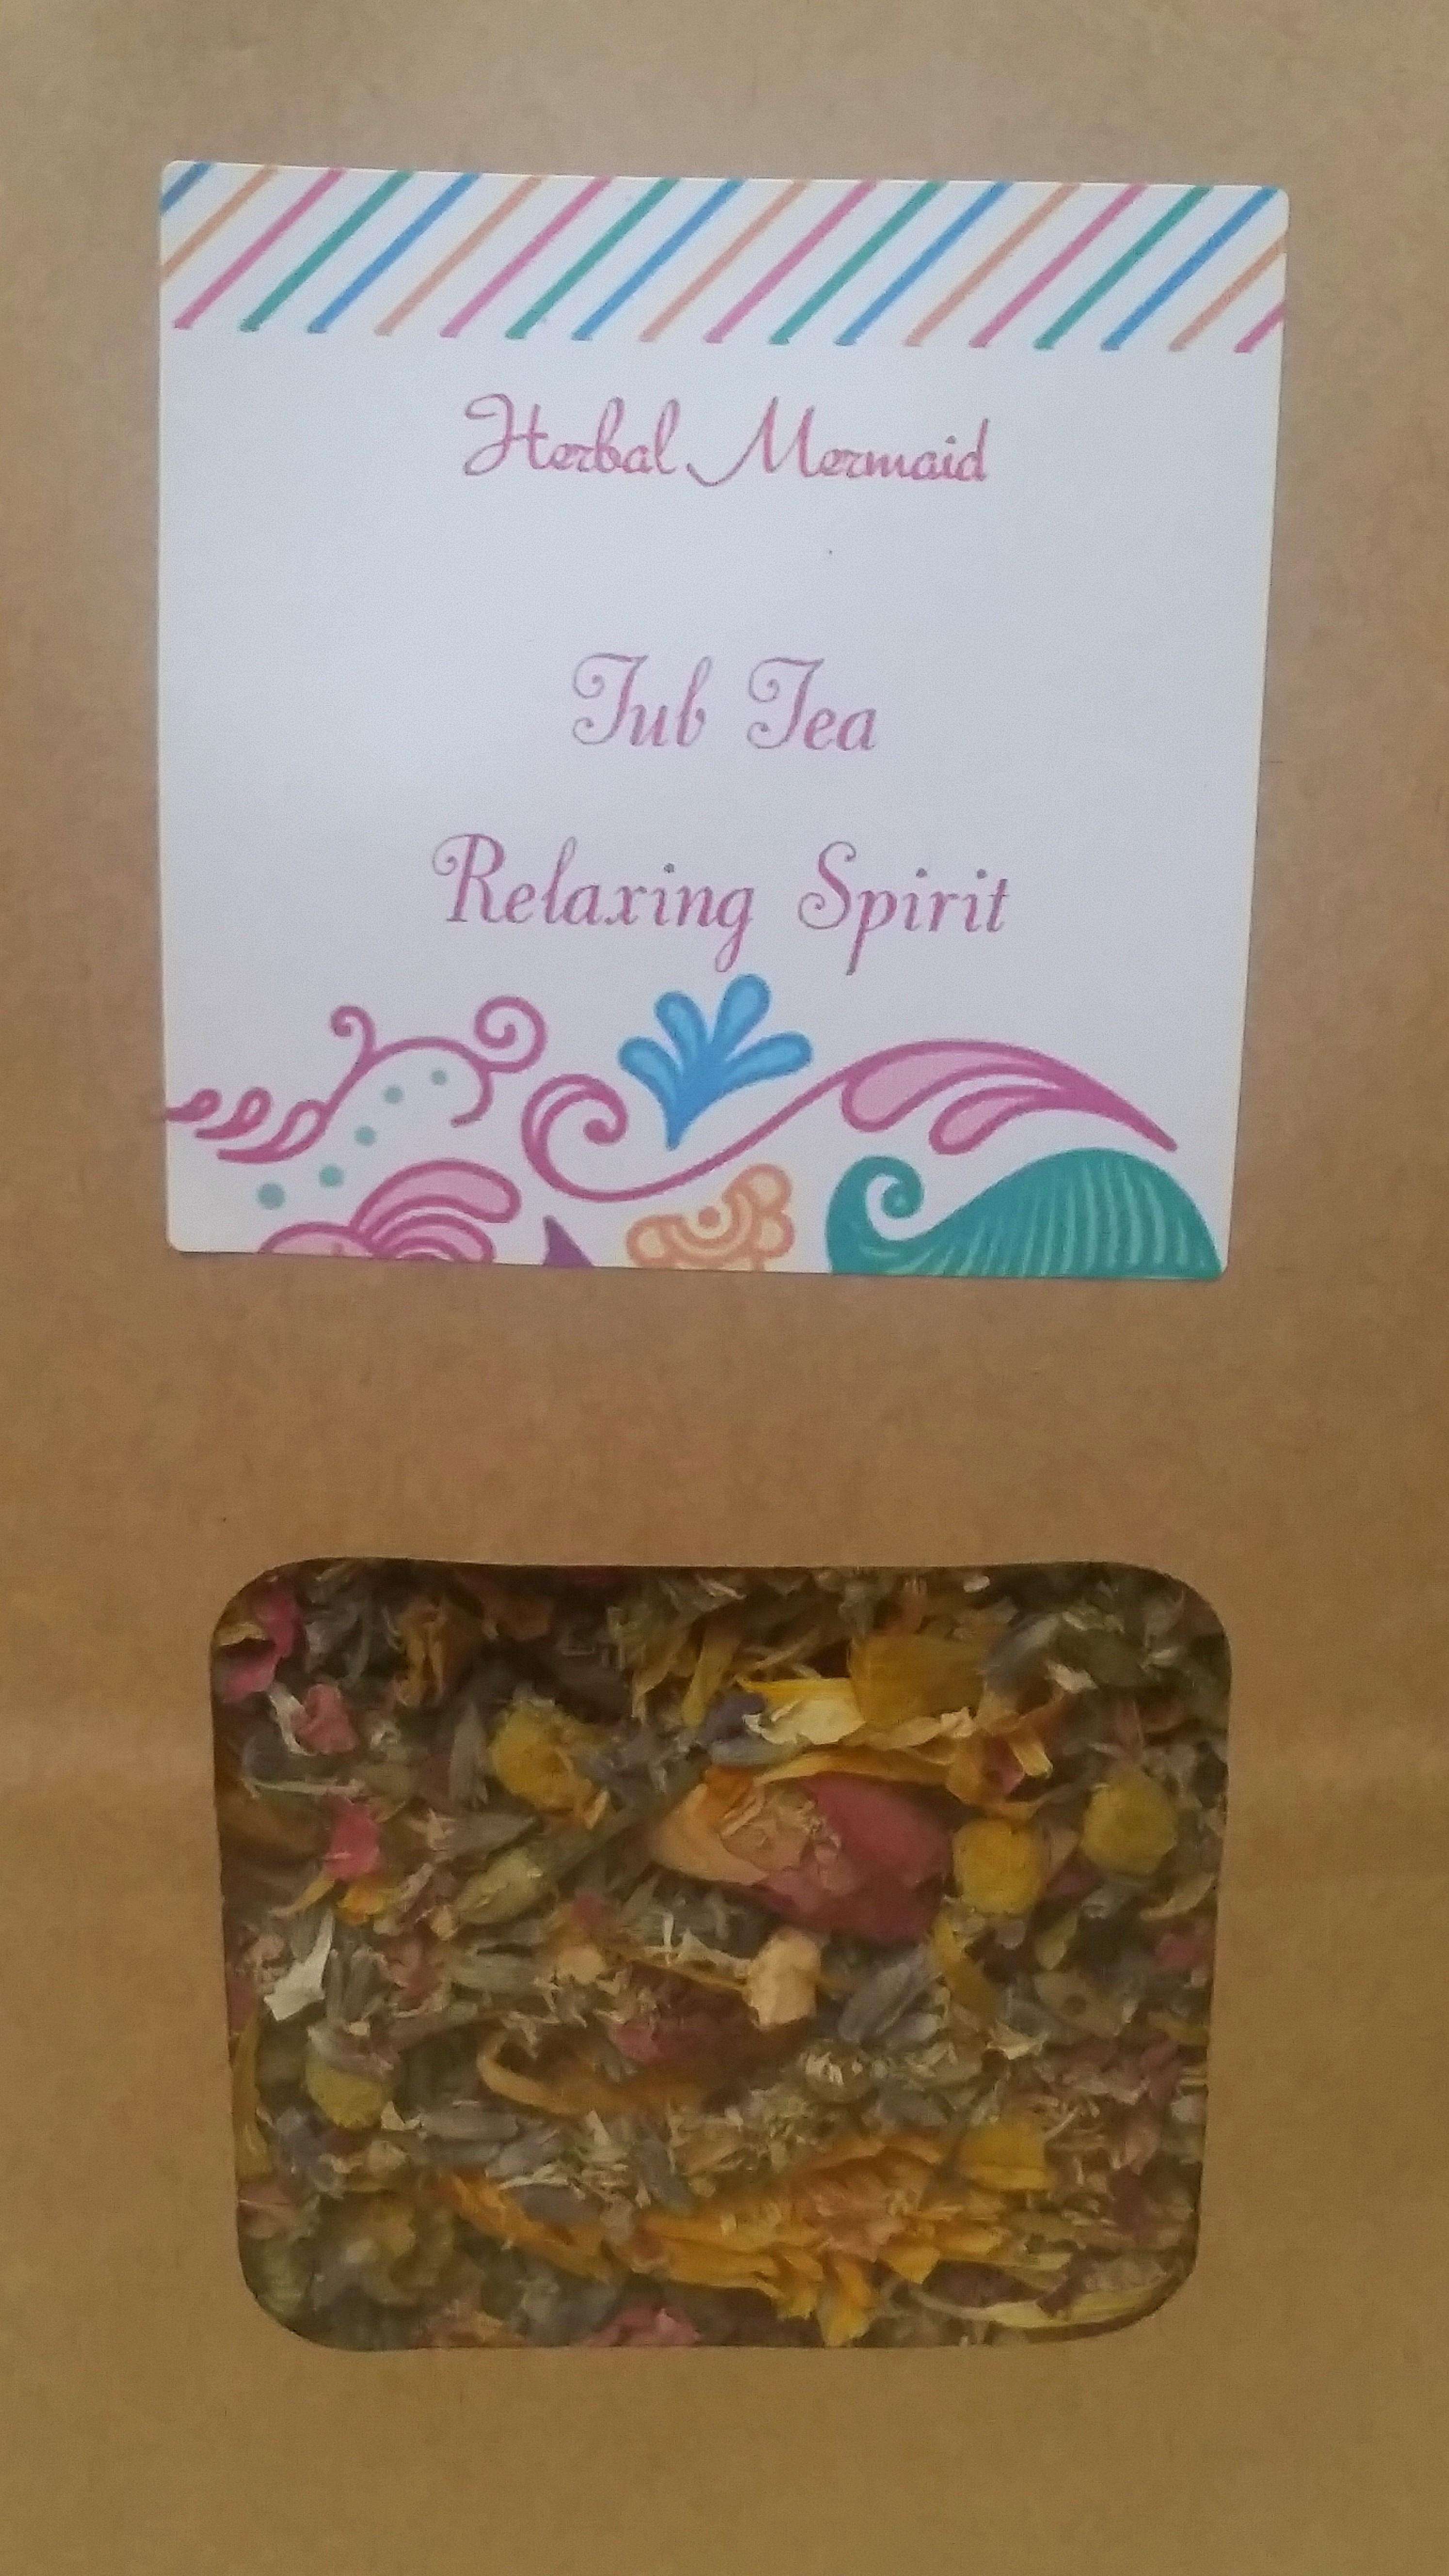 Rejuvenating & Regenerating Bath Herbs from Herbal Mermaid Botanica